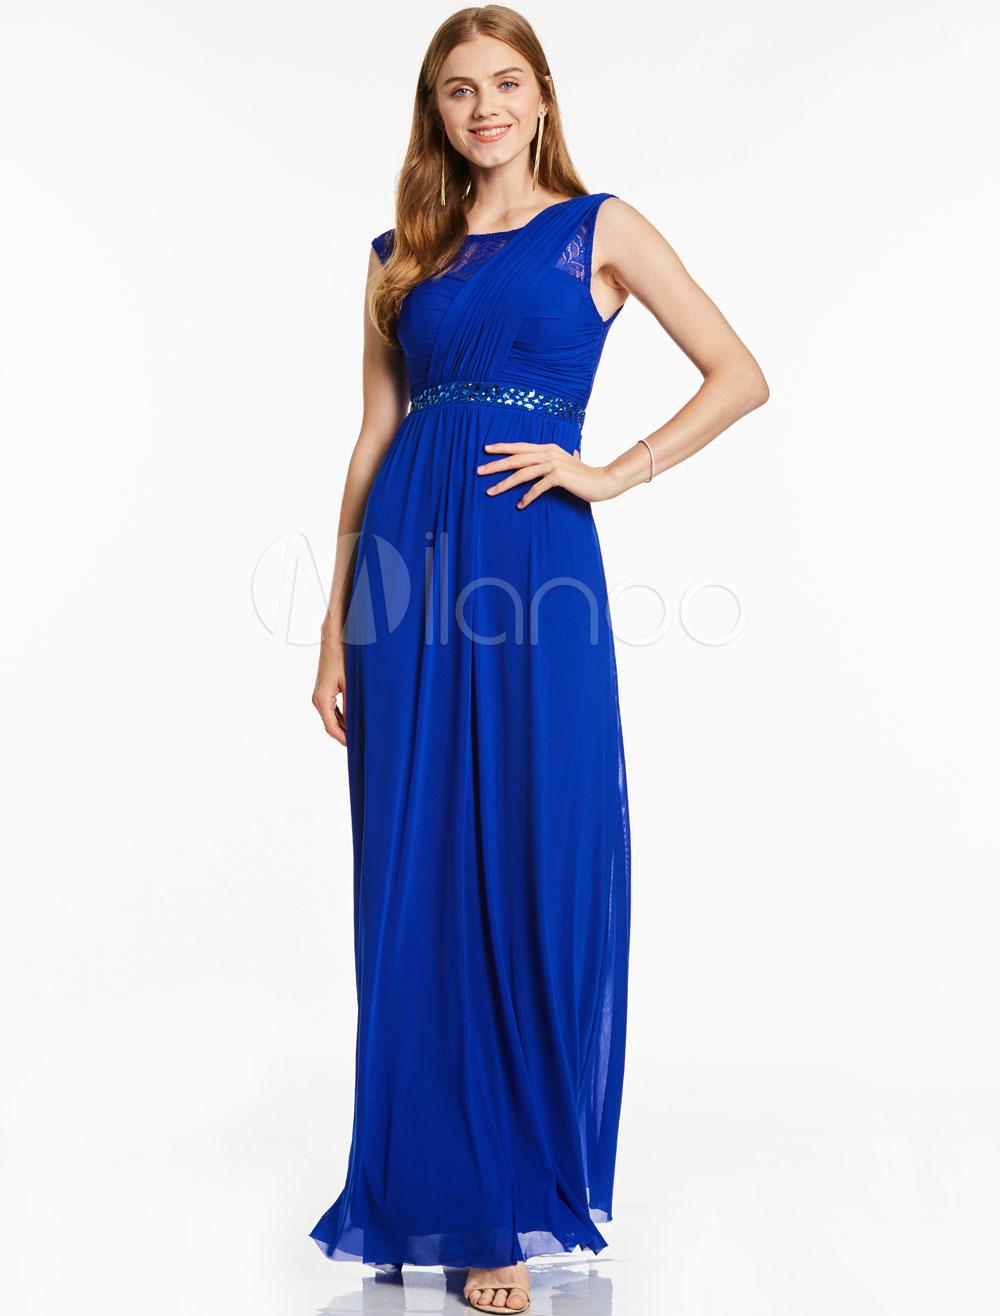 Buy Prom Dresses Long Royal Blue Beading Sash Sleeveless Chiffon Floor Length Party Dress for $66.74 in Milanoo store